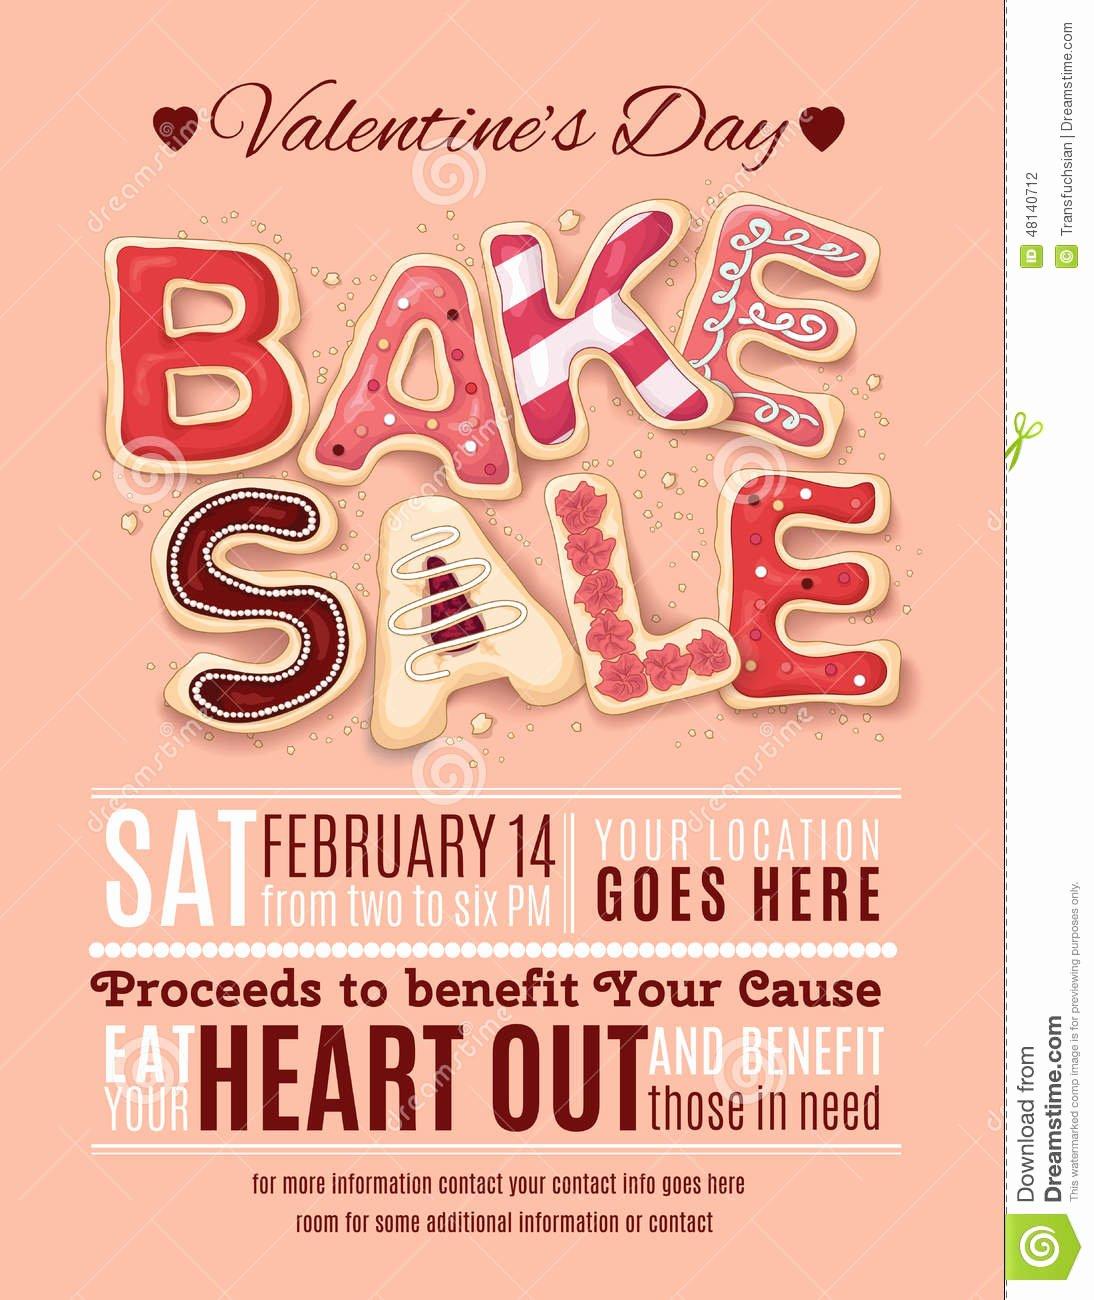 Bake Sale Flyer Templates Free New Valentines Day Bake Sale Flyer Template Stock Vector